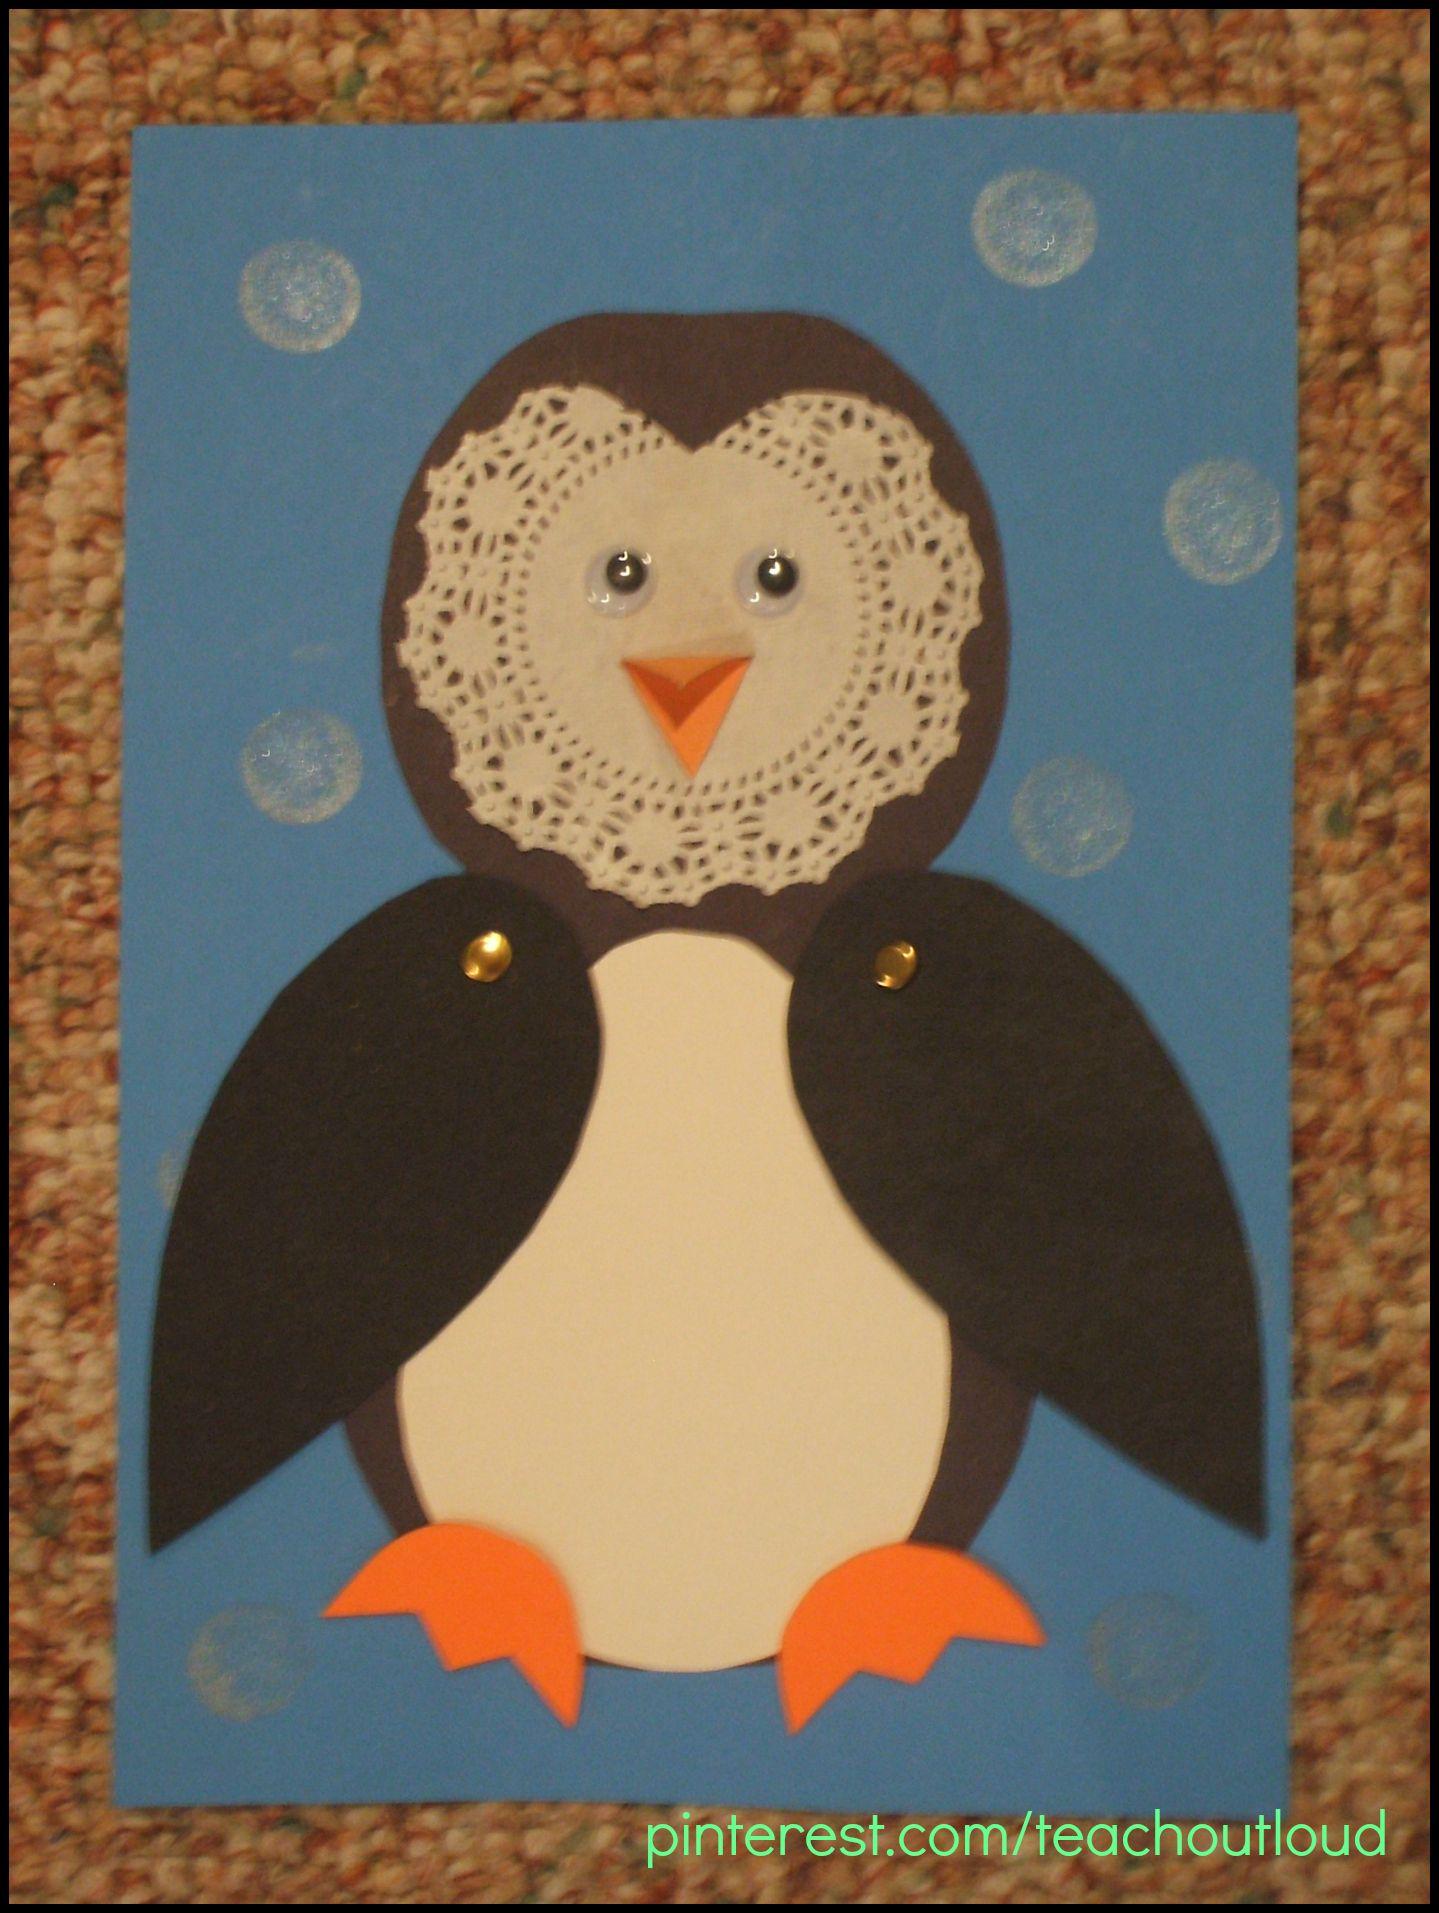 Doily Penguin Preschool Craft Following Directions Patterning Scissor Skills Fine Motor